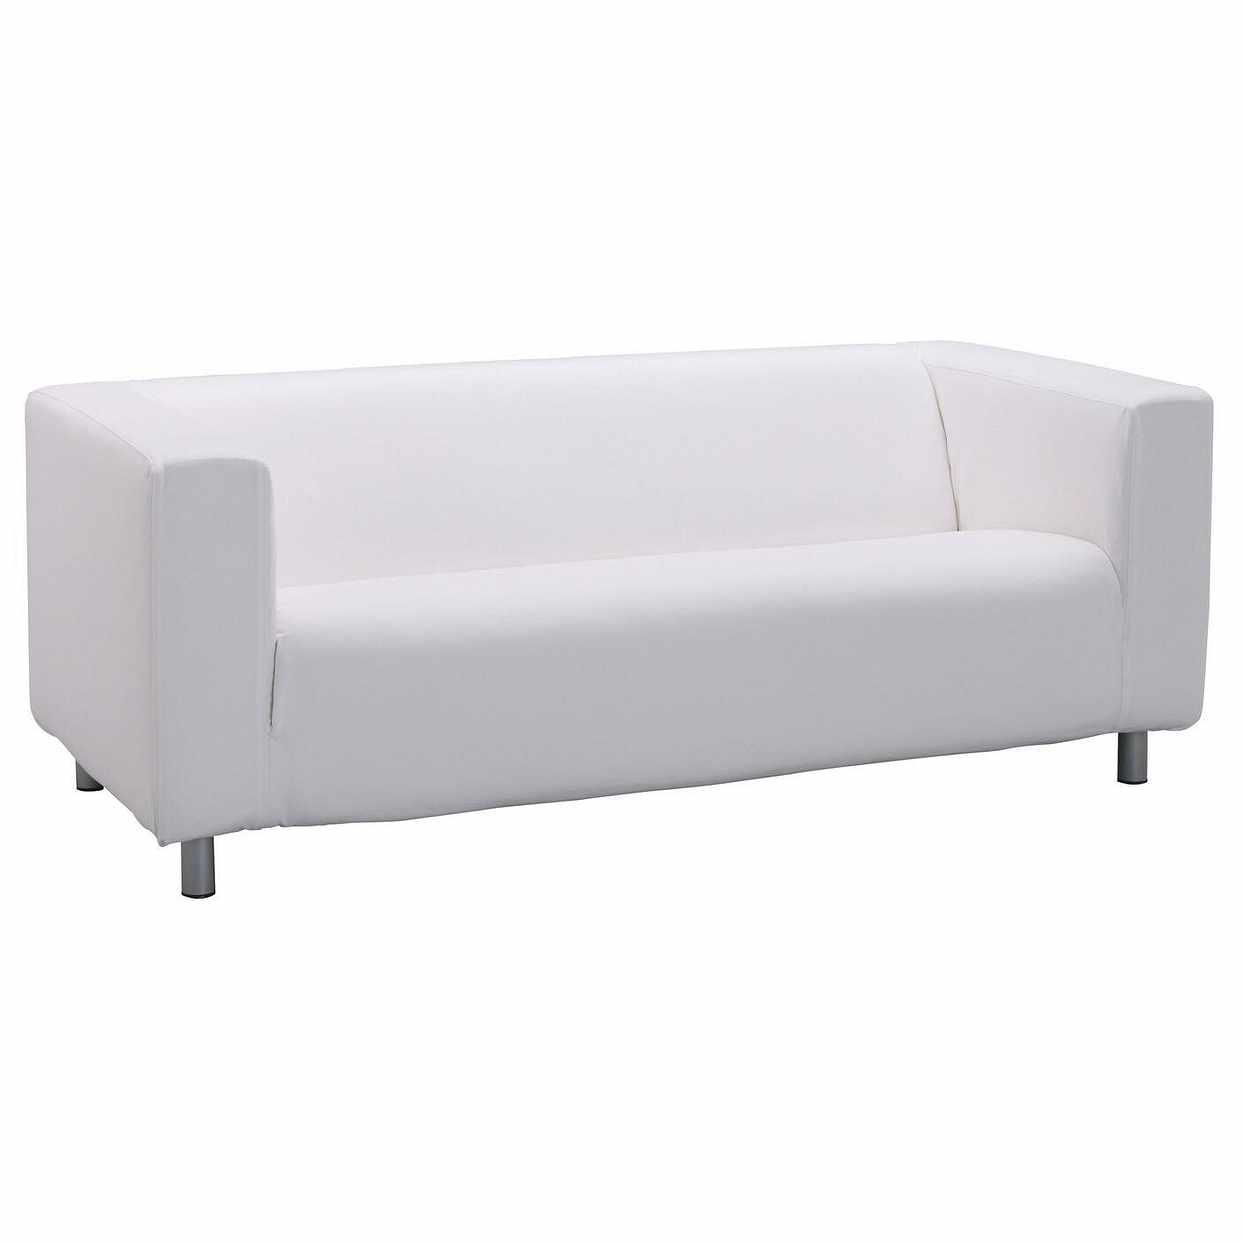 image of Ikea klippan soffa - Stockholm